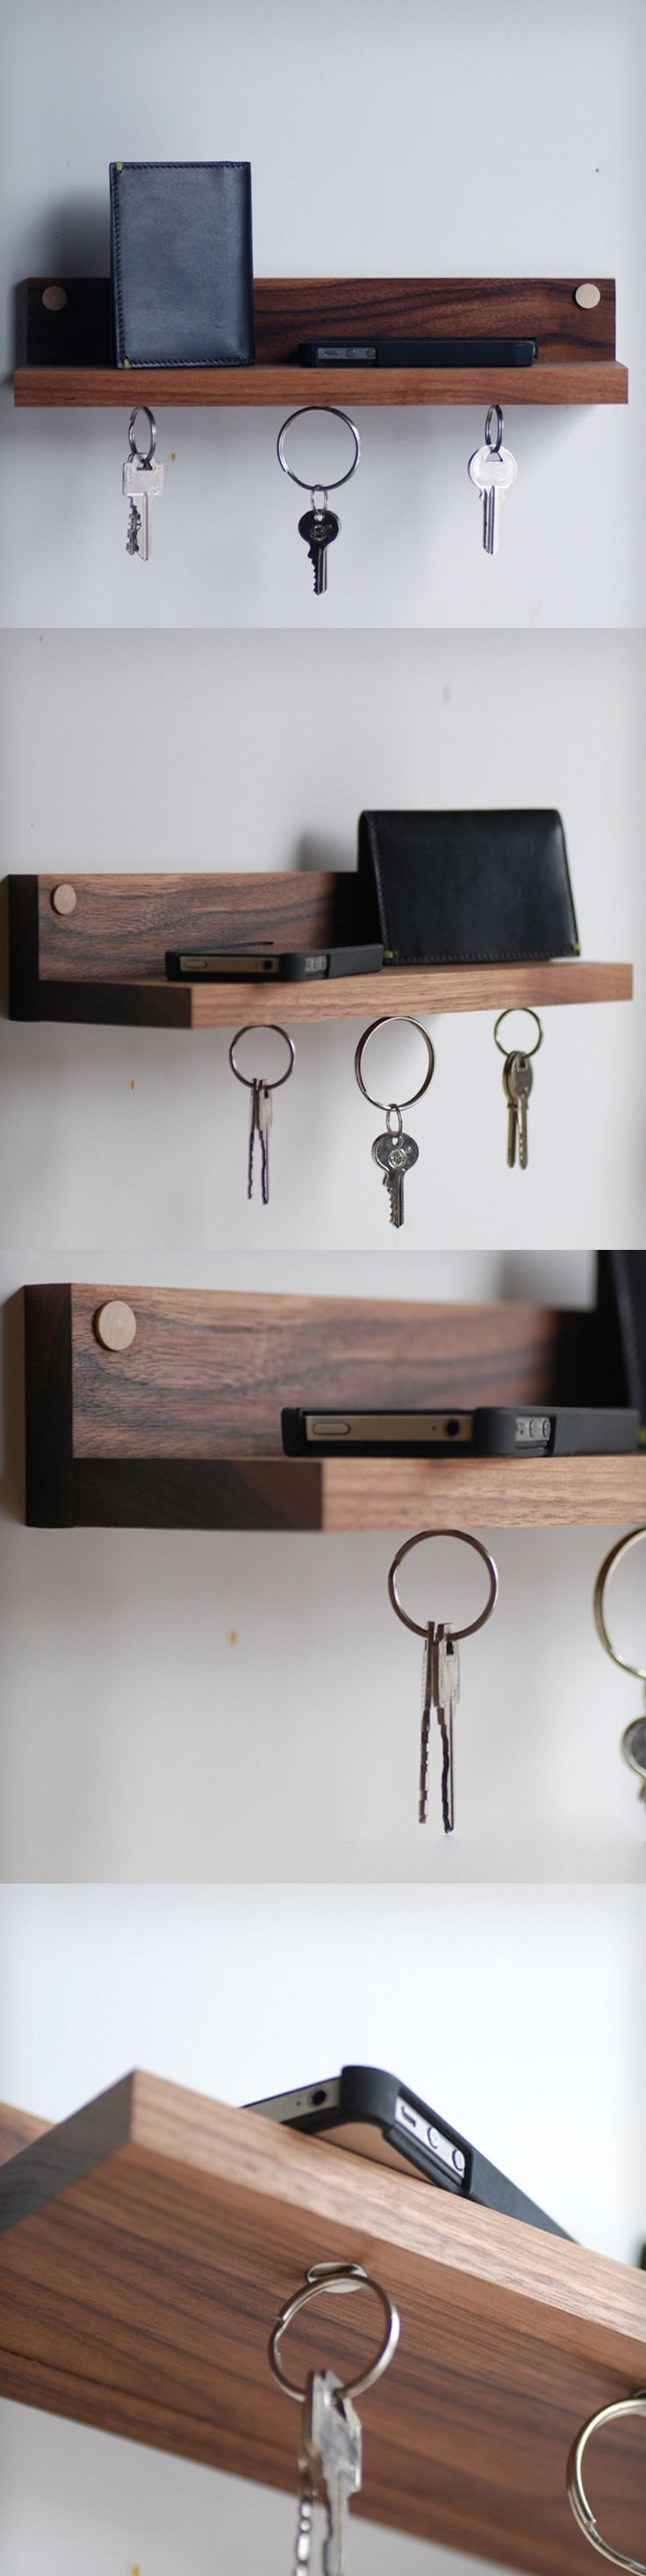 Porta llaves Wood ShelfKey HoldersBook 23